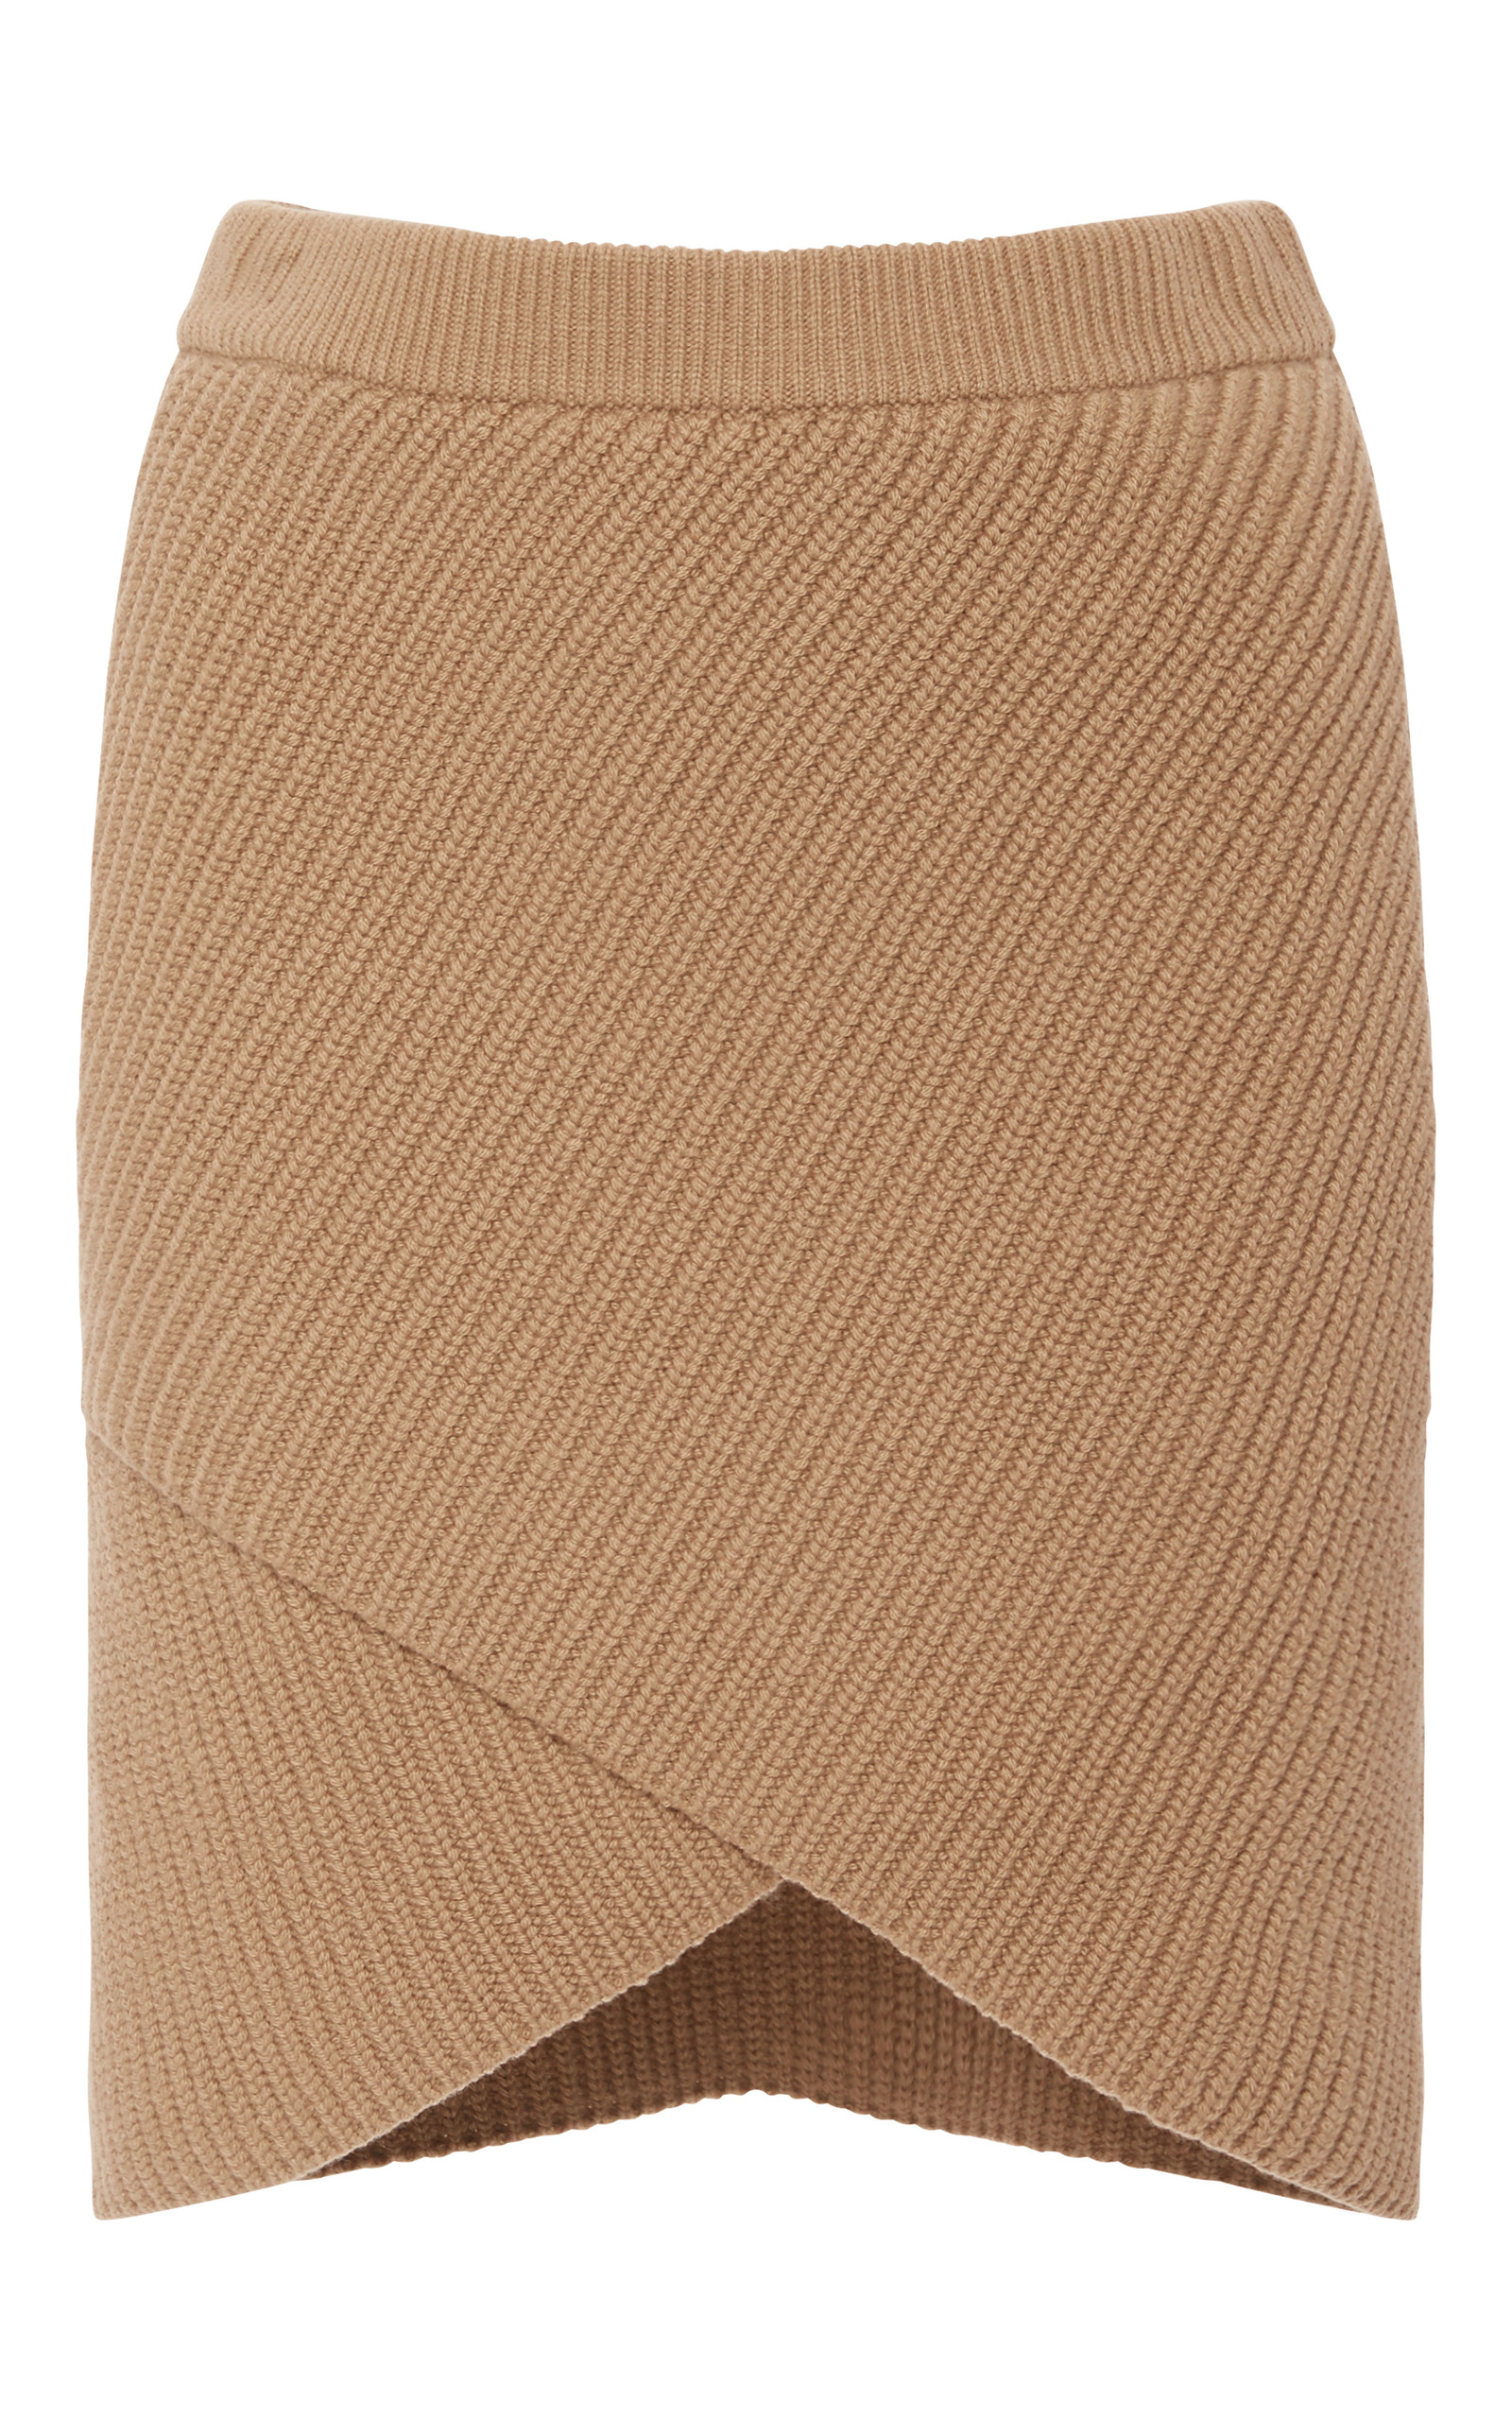 53dbd3bbd8 Mini Cashmere Skirt by Michael Kors Collection | Moda Operandi